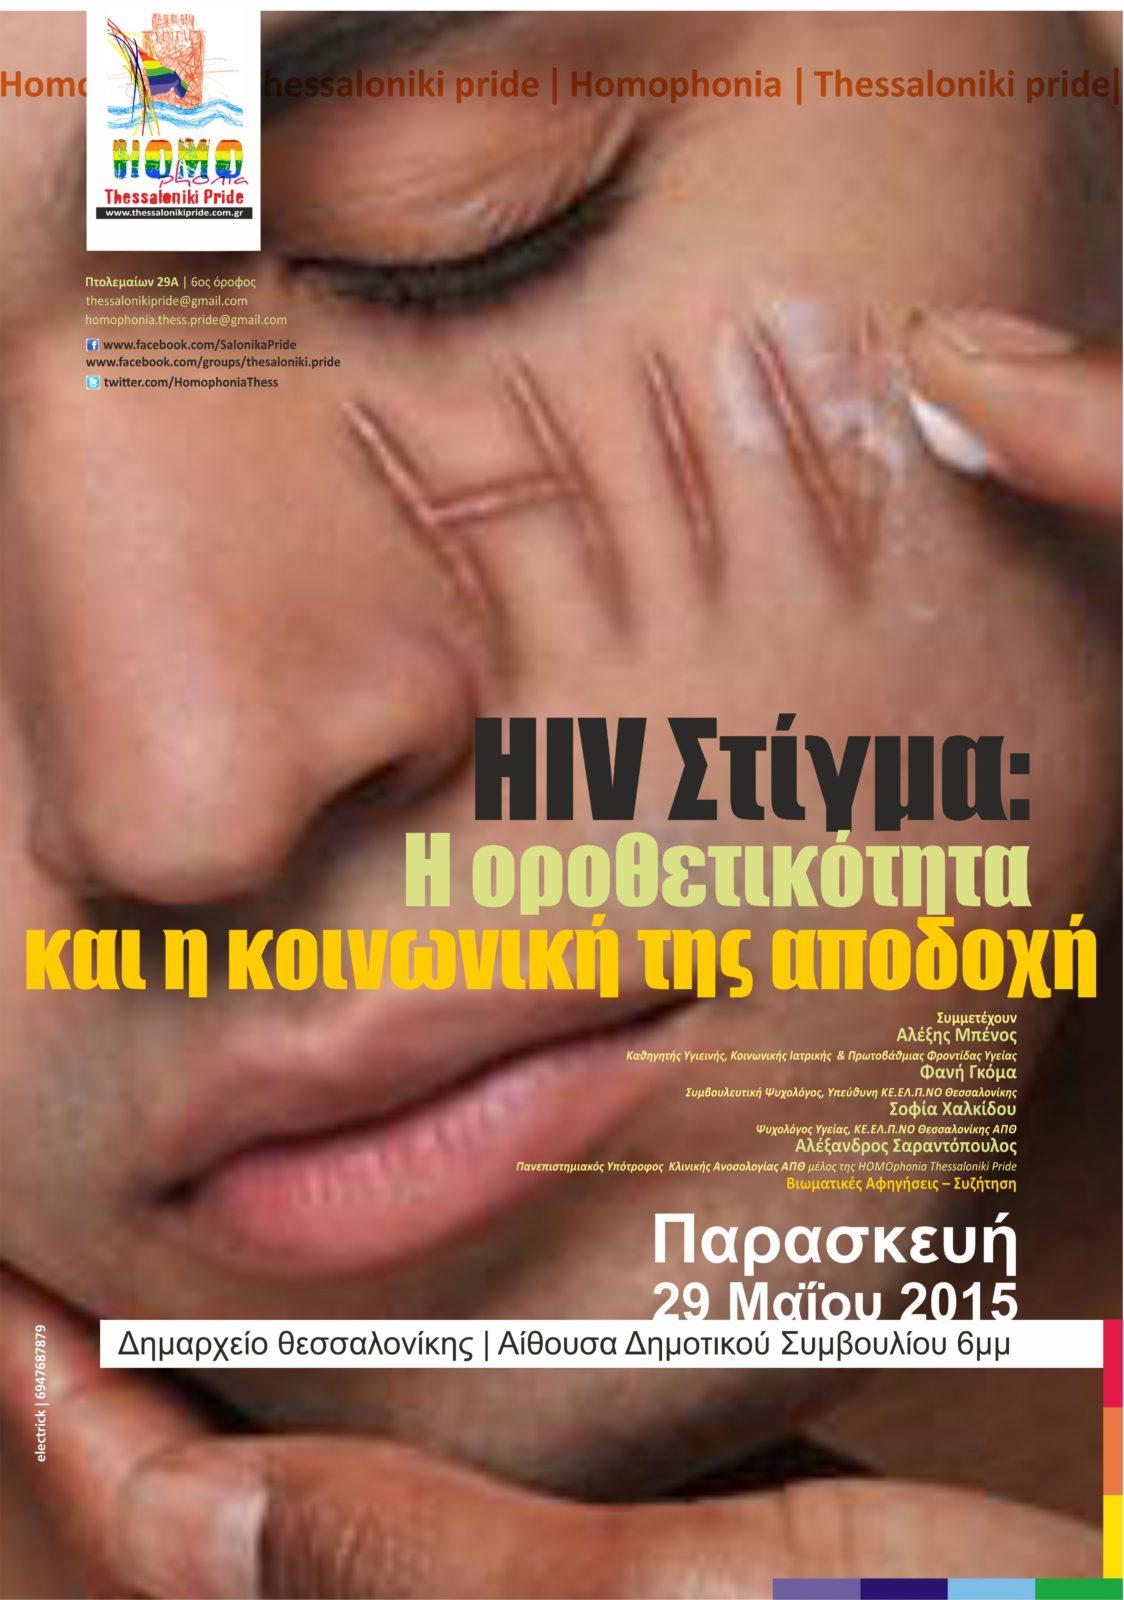 stigma ΑΦΙΣΑ (3) (1)